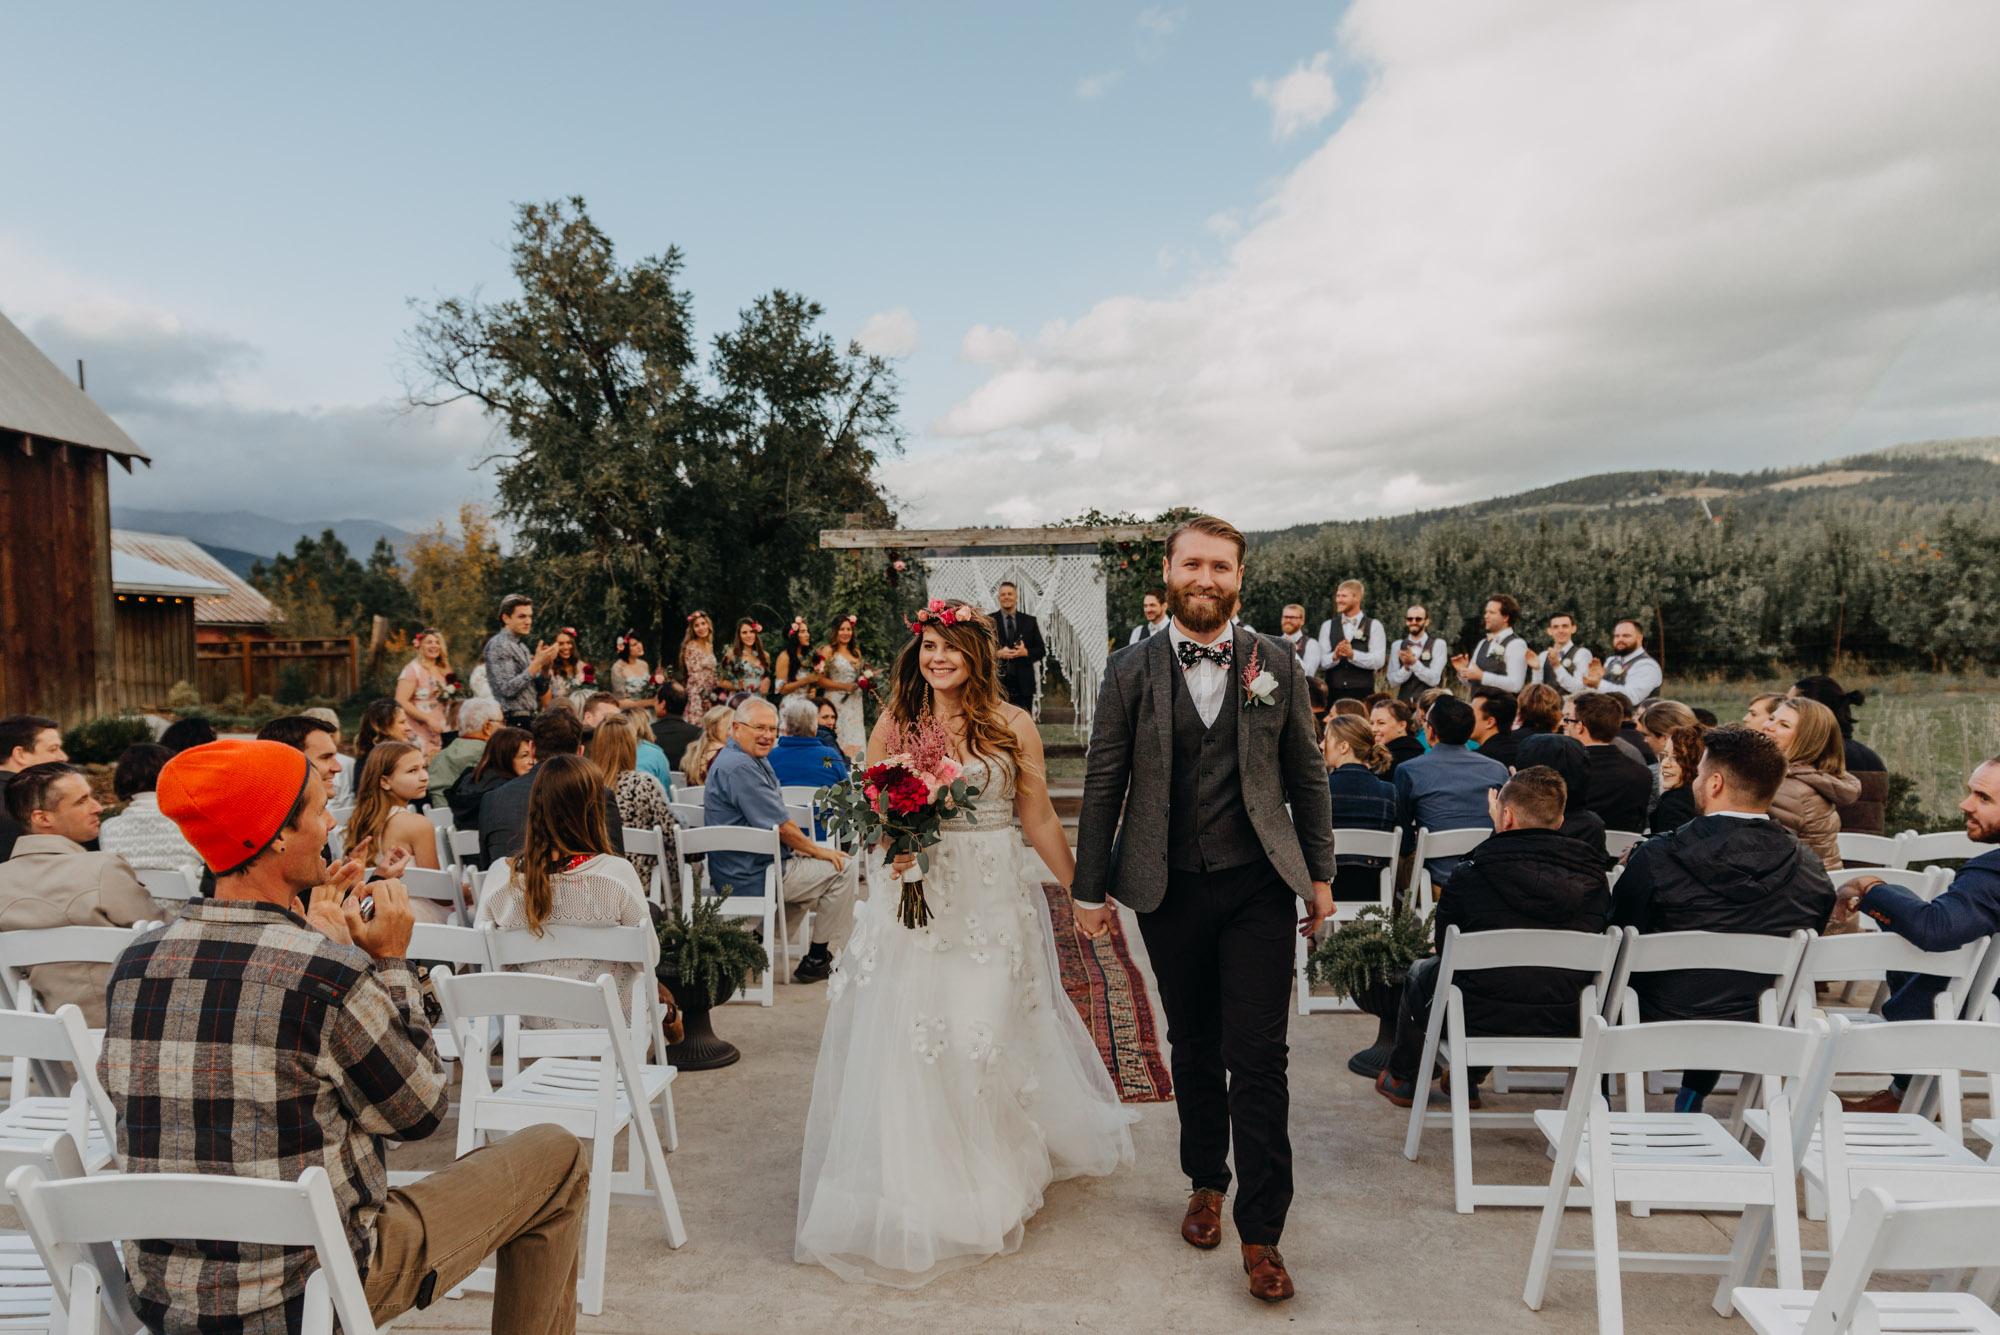 Outdoor-Summer-Ceremony-Washington-Wedding-Rainbow-5451.jpg